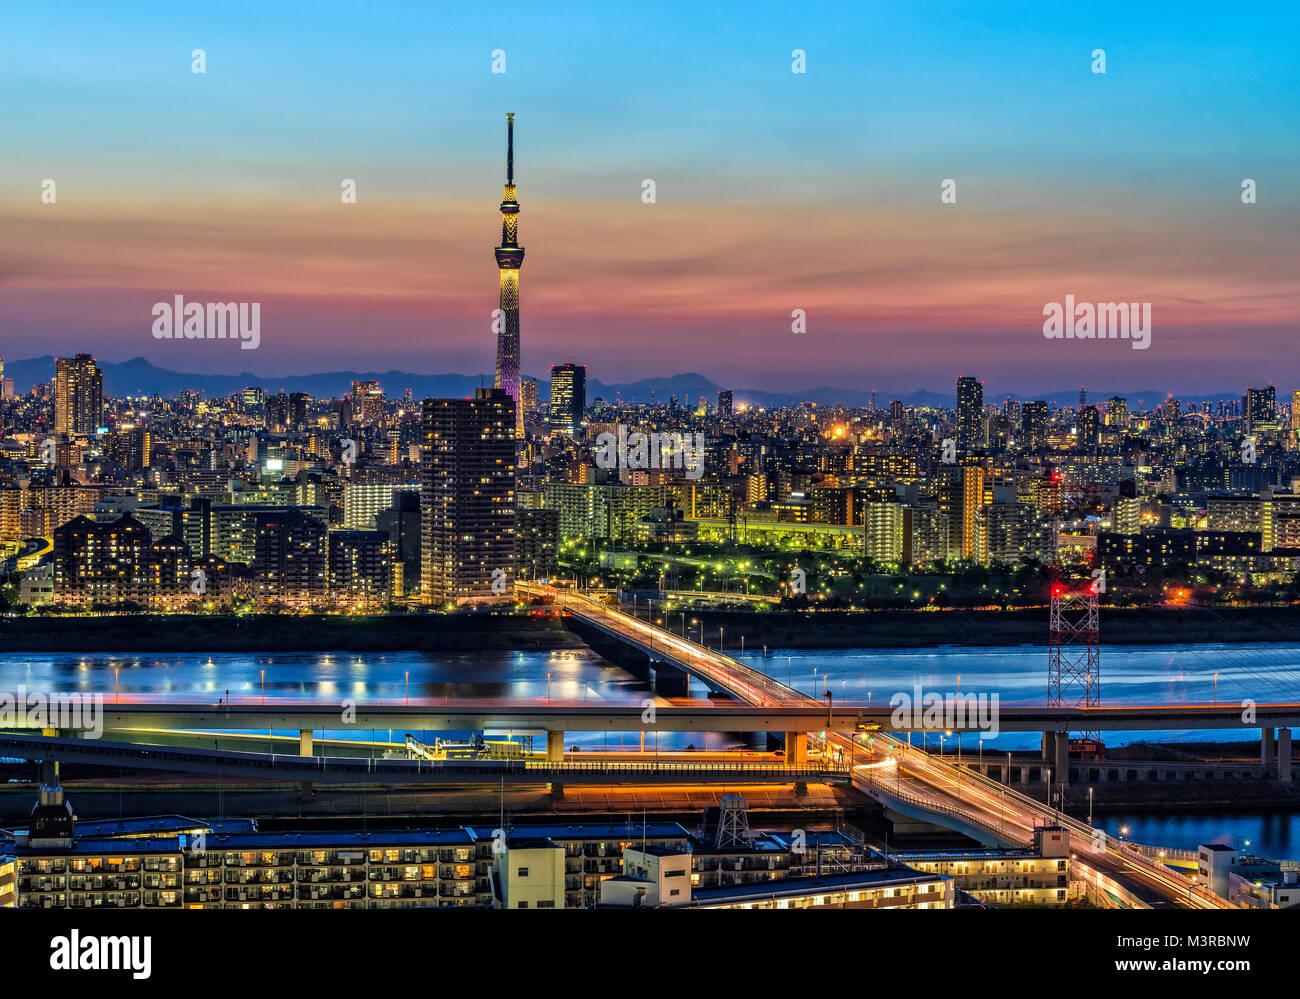 L'île de Honshu, Japon, Tokyo, Kanto, Skyline at Dusk. Photo Stock